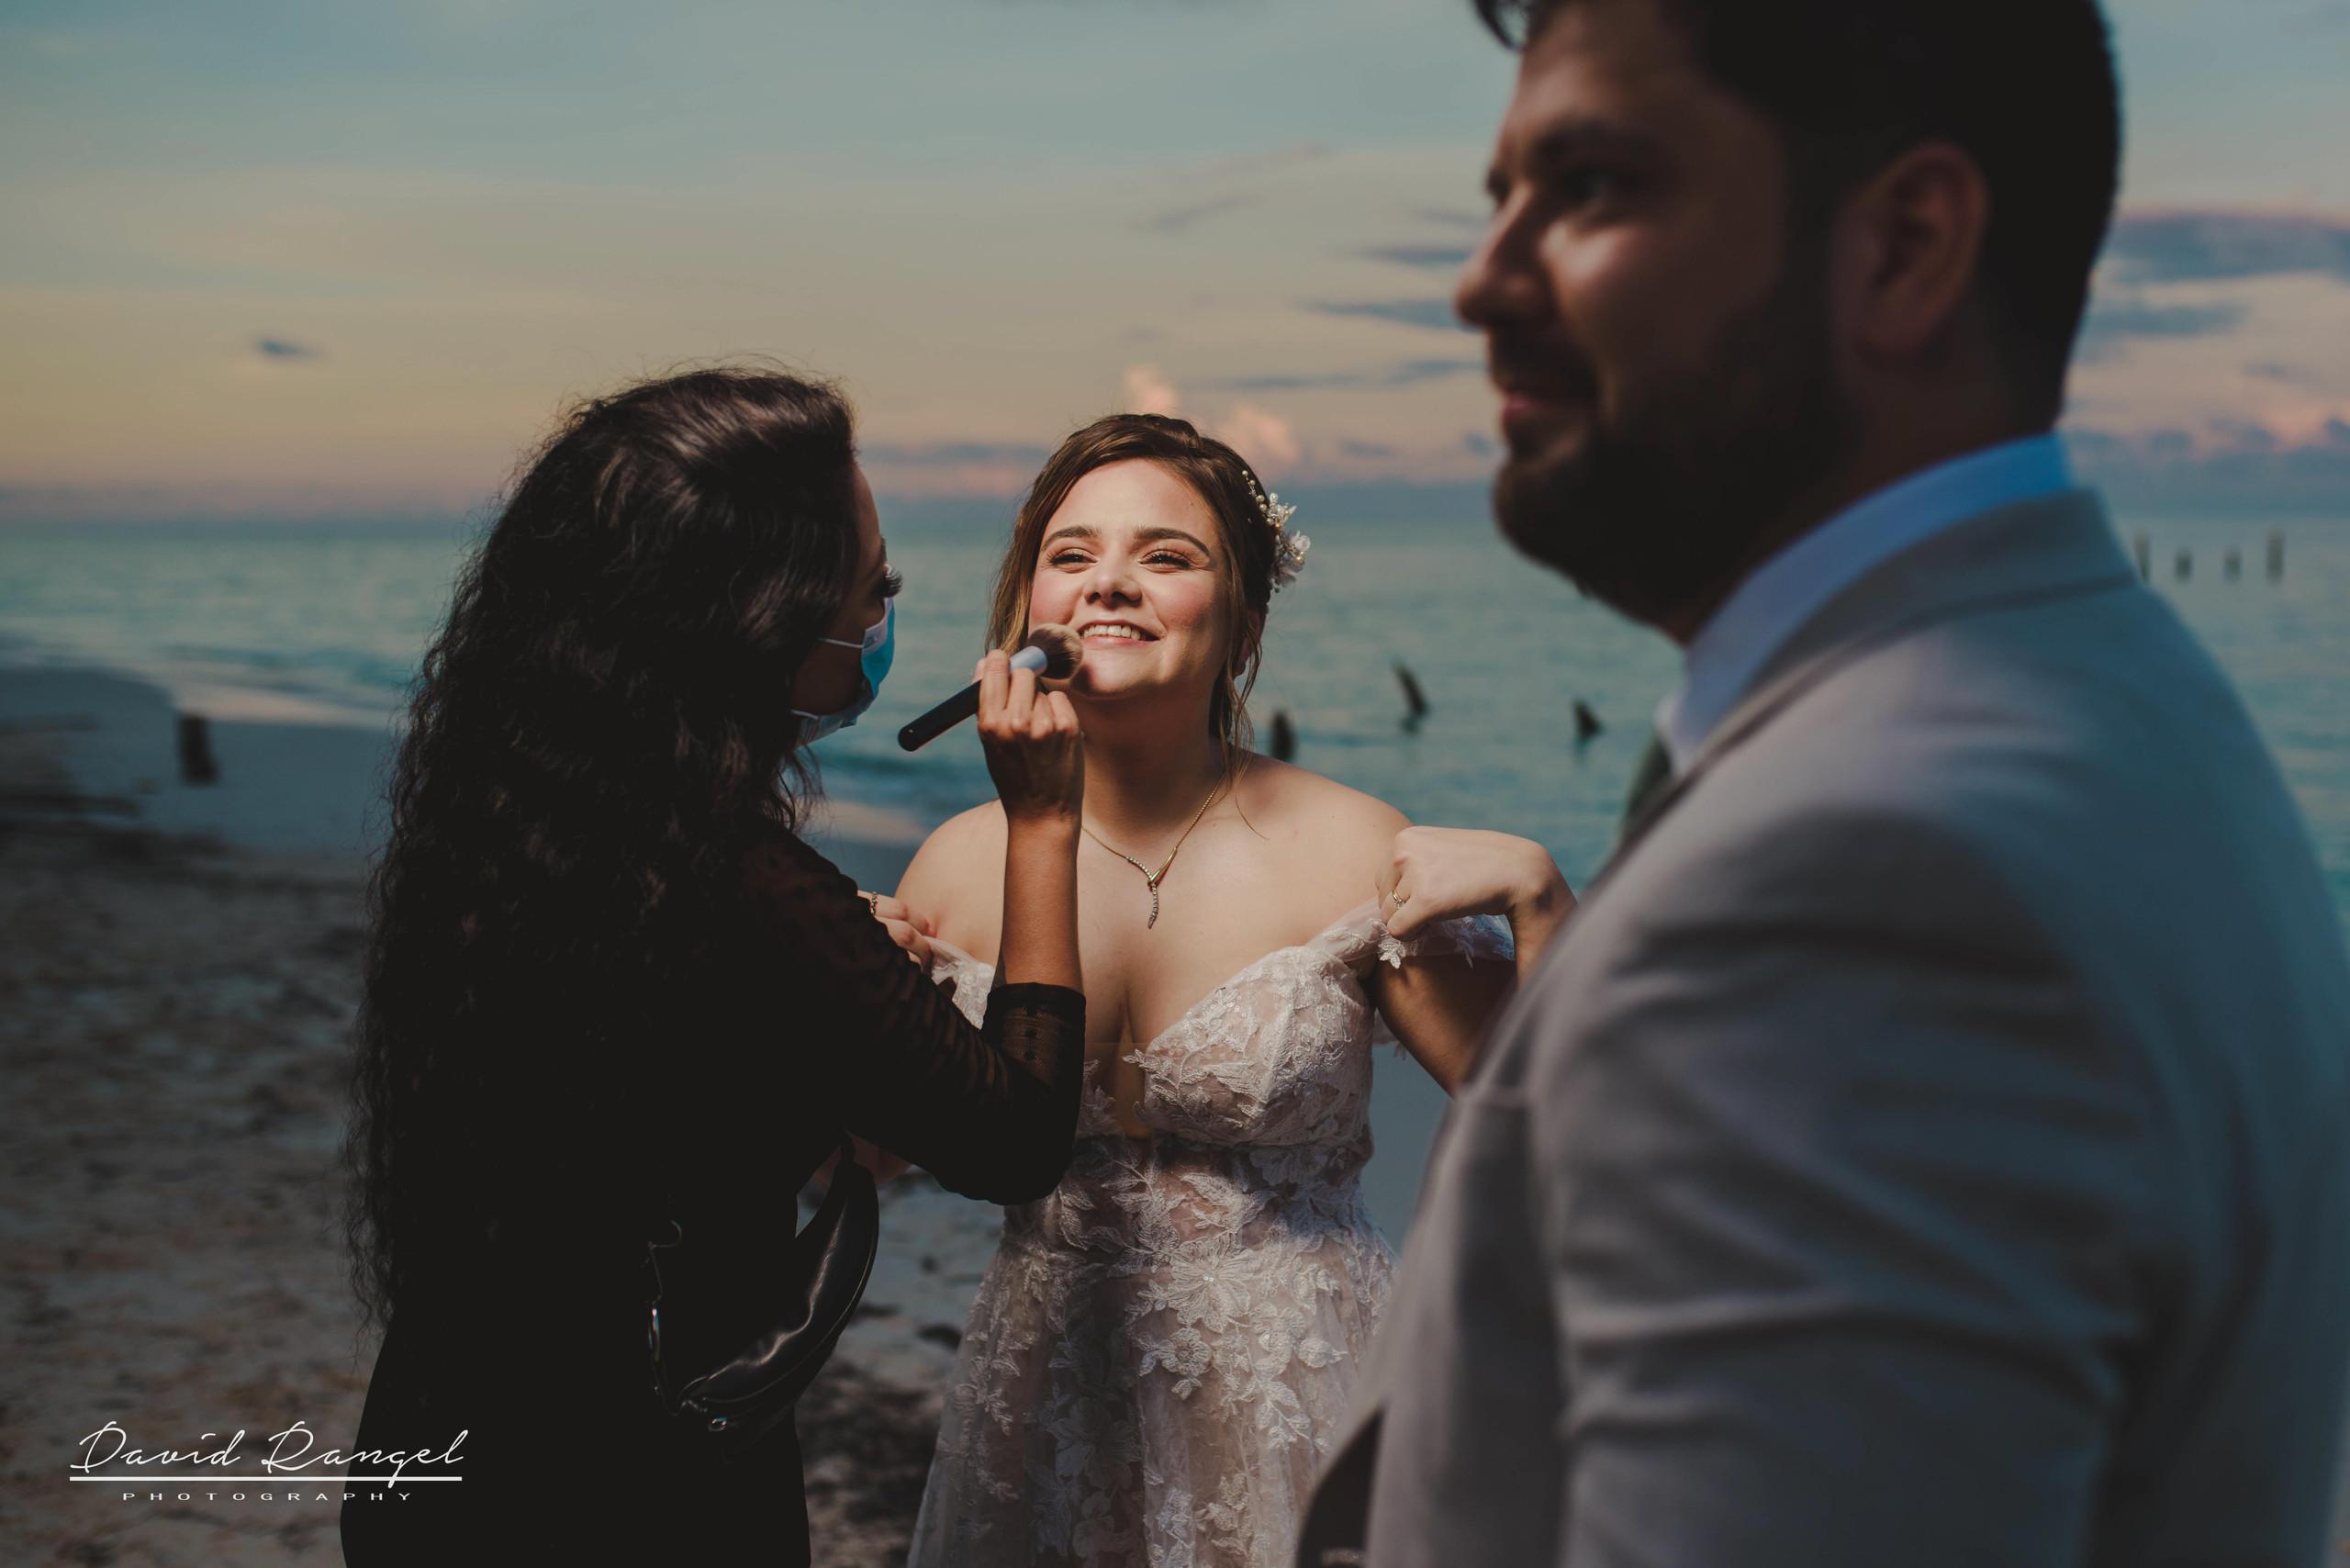 bride+groom+beach+sunset+session+happy+love+couple+celebration+wedding+makeup